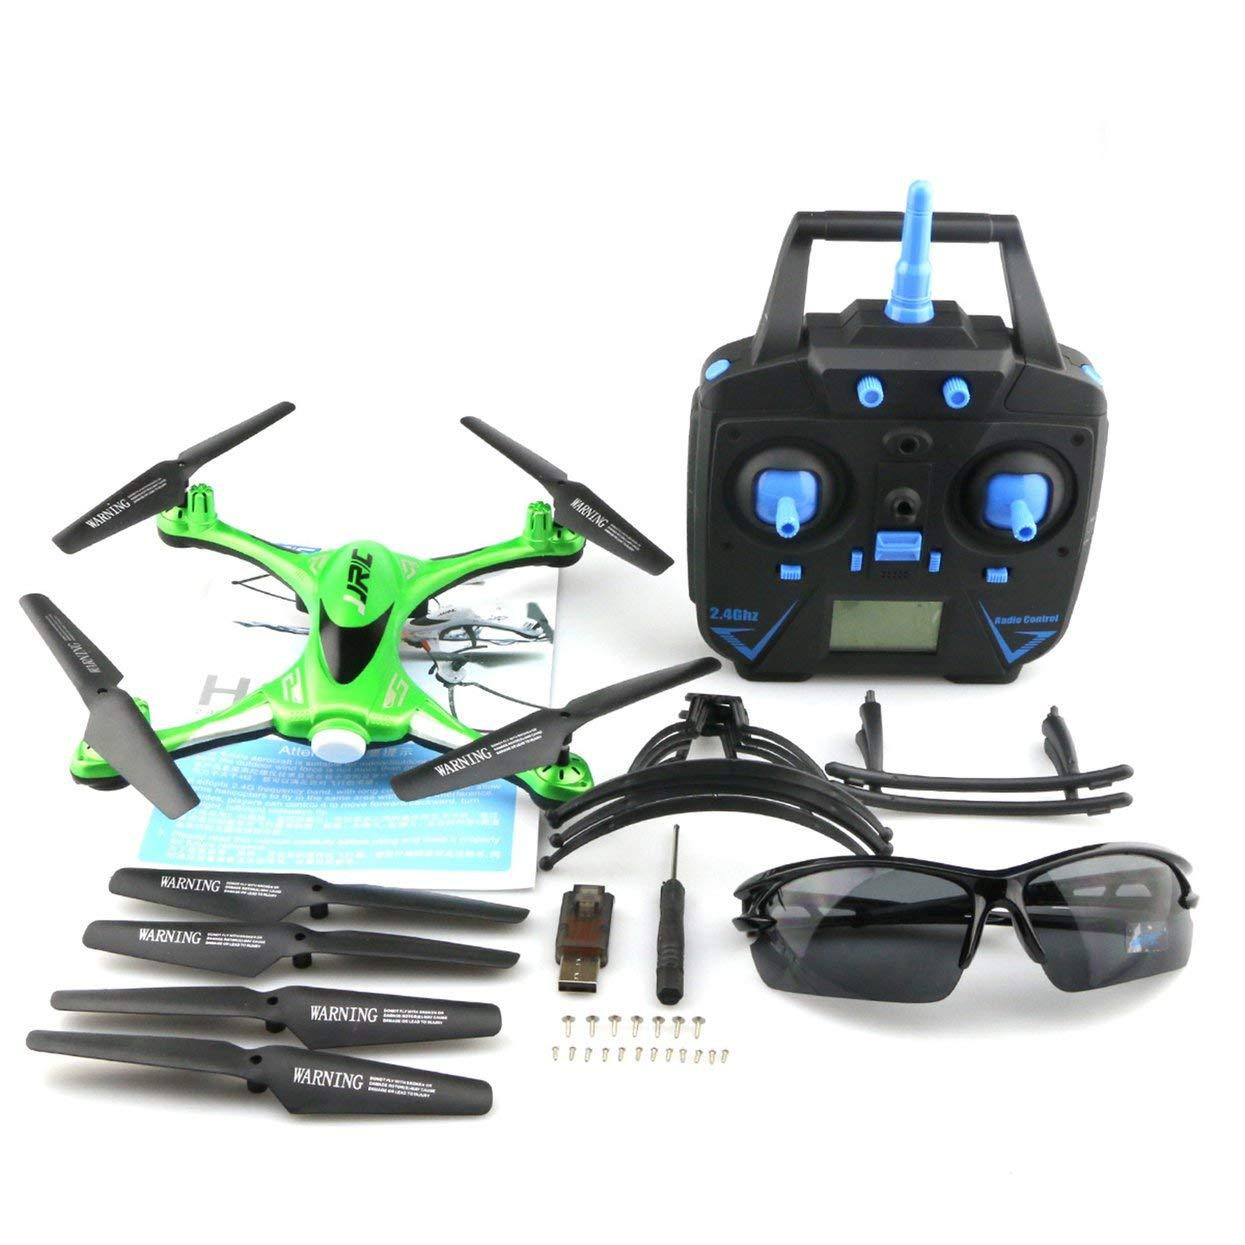 JJR C H31 2,4 GHz 4CH 6-Achsen-Gyro RC Quadcopter Wasserdicht Wasserdicht Wasserdicht RTF Mini-Drohne mit CF Headless Modus One-Key Return   3D Flip & Roll f324b3